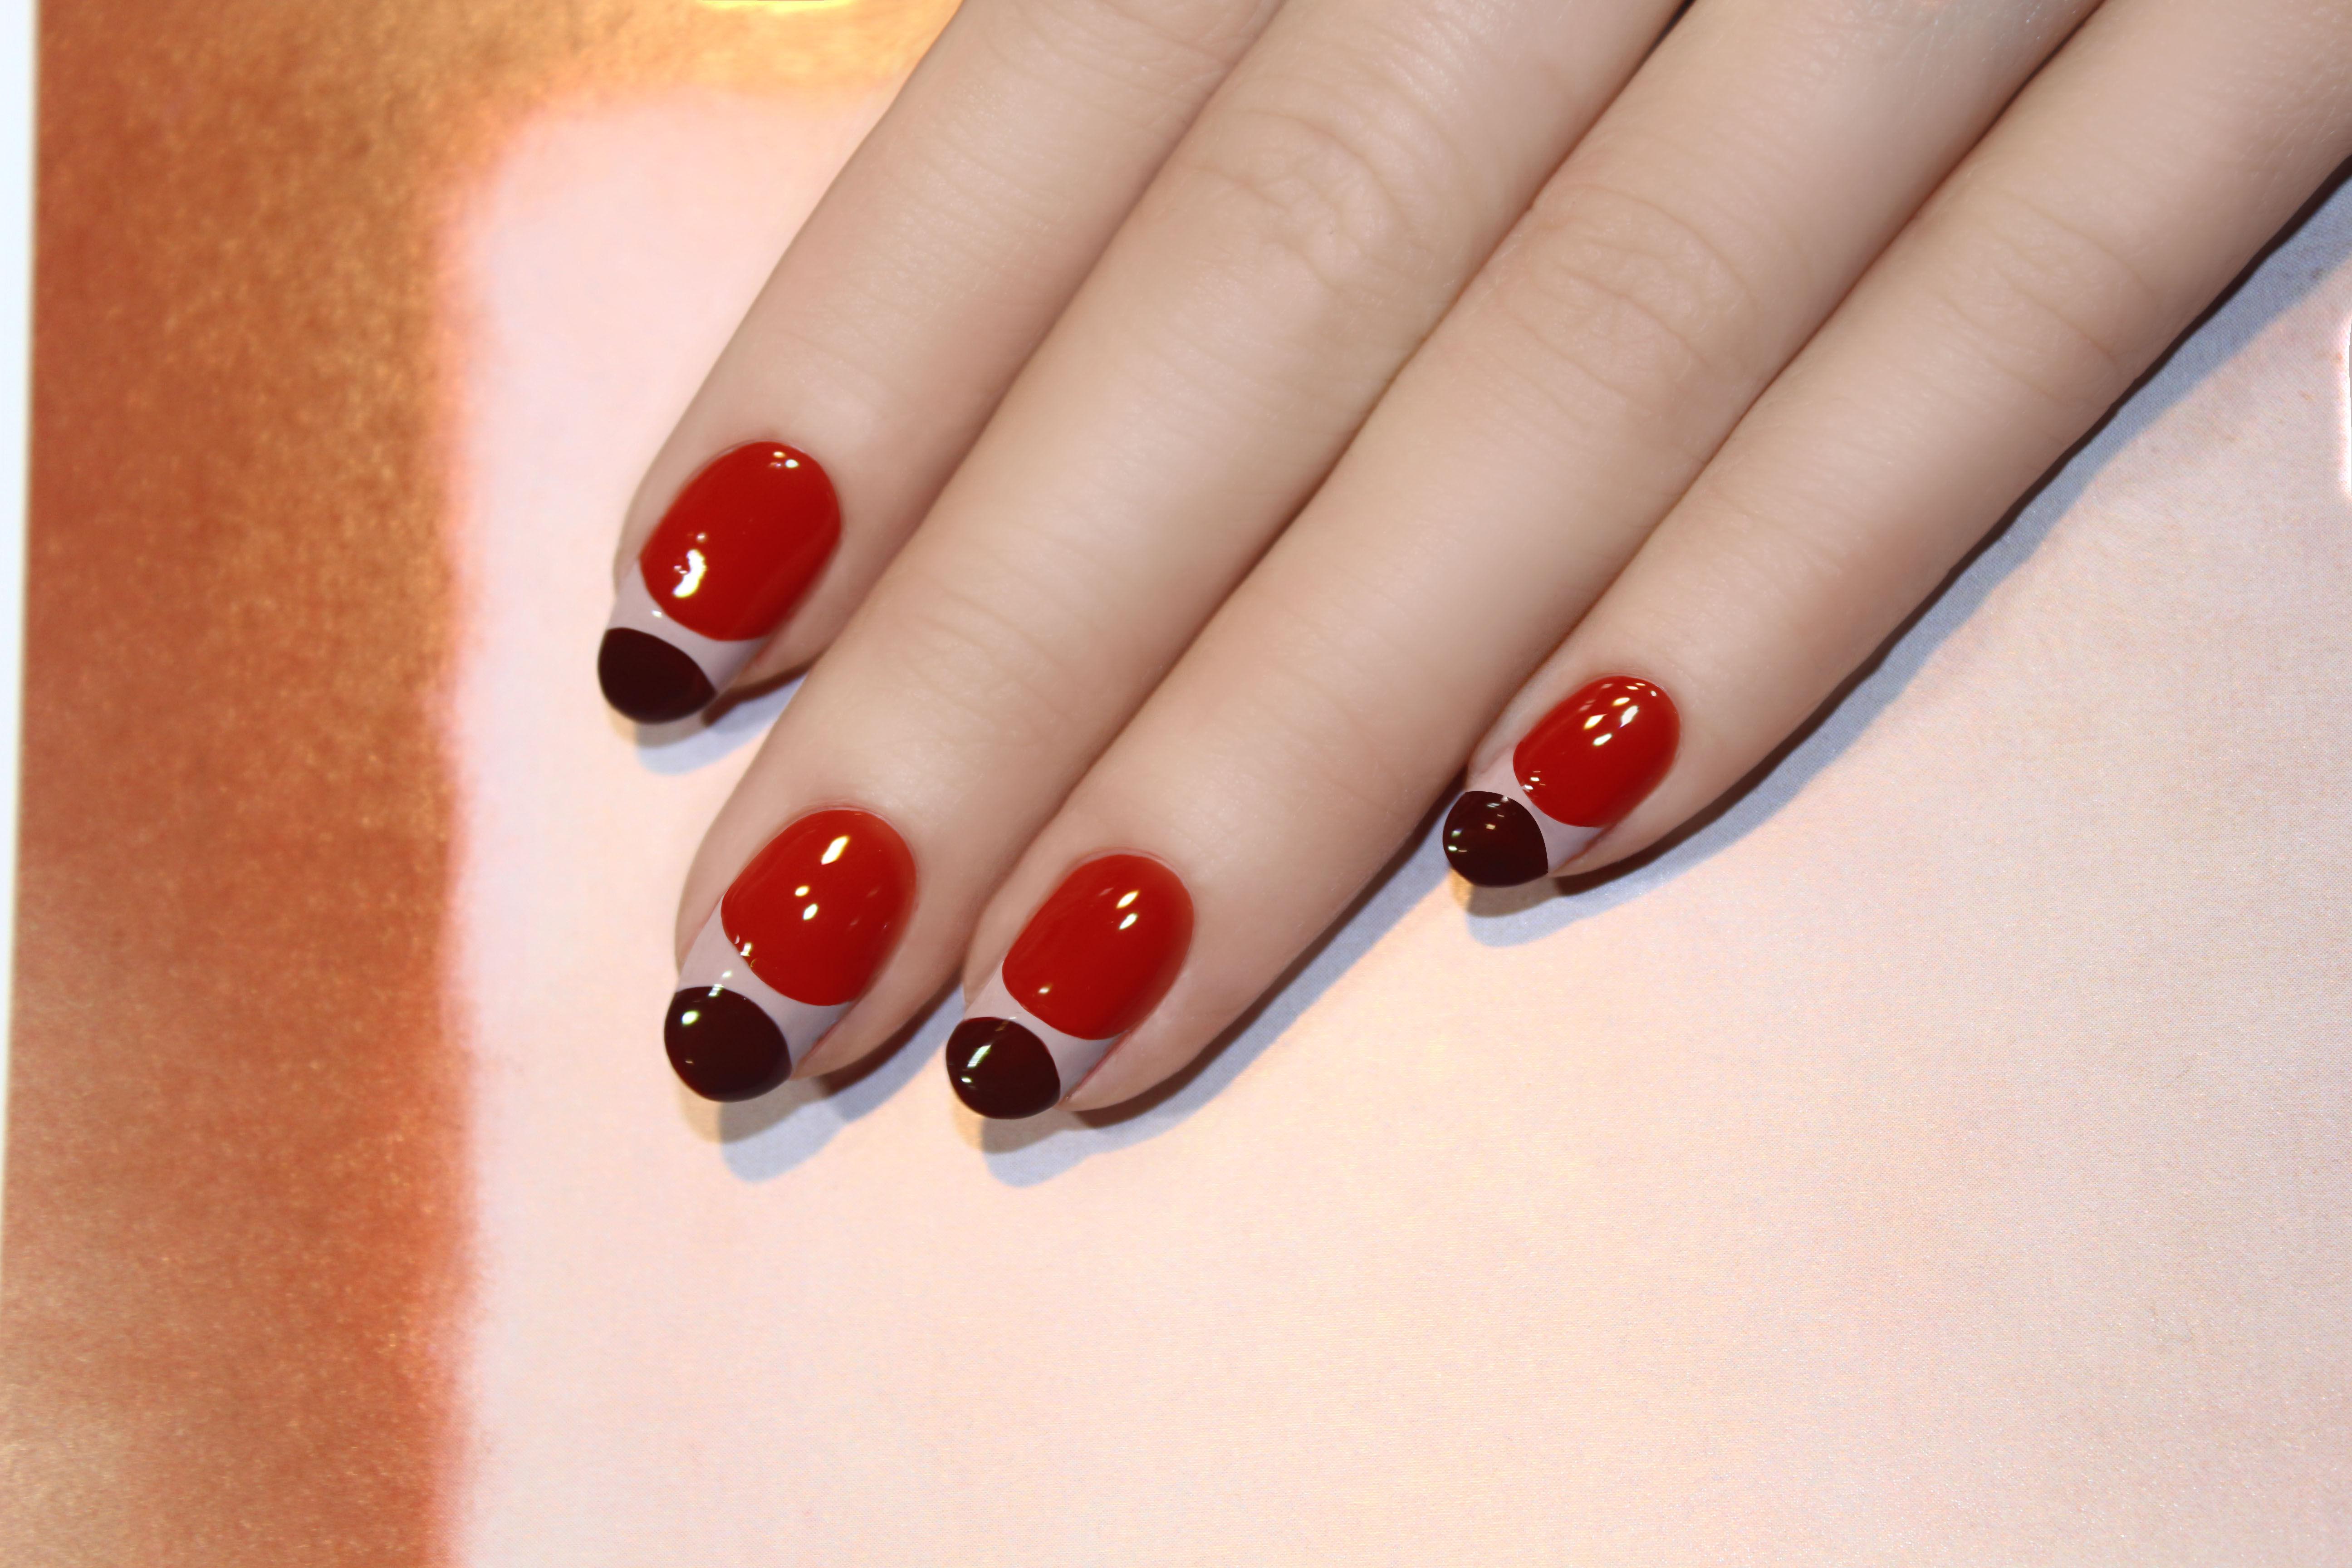 Double moon manicure